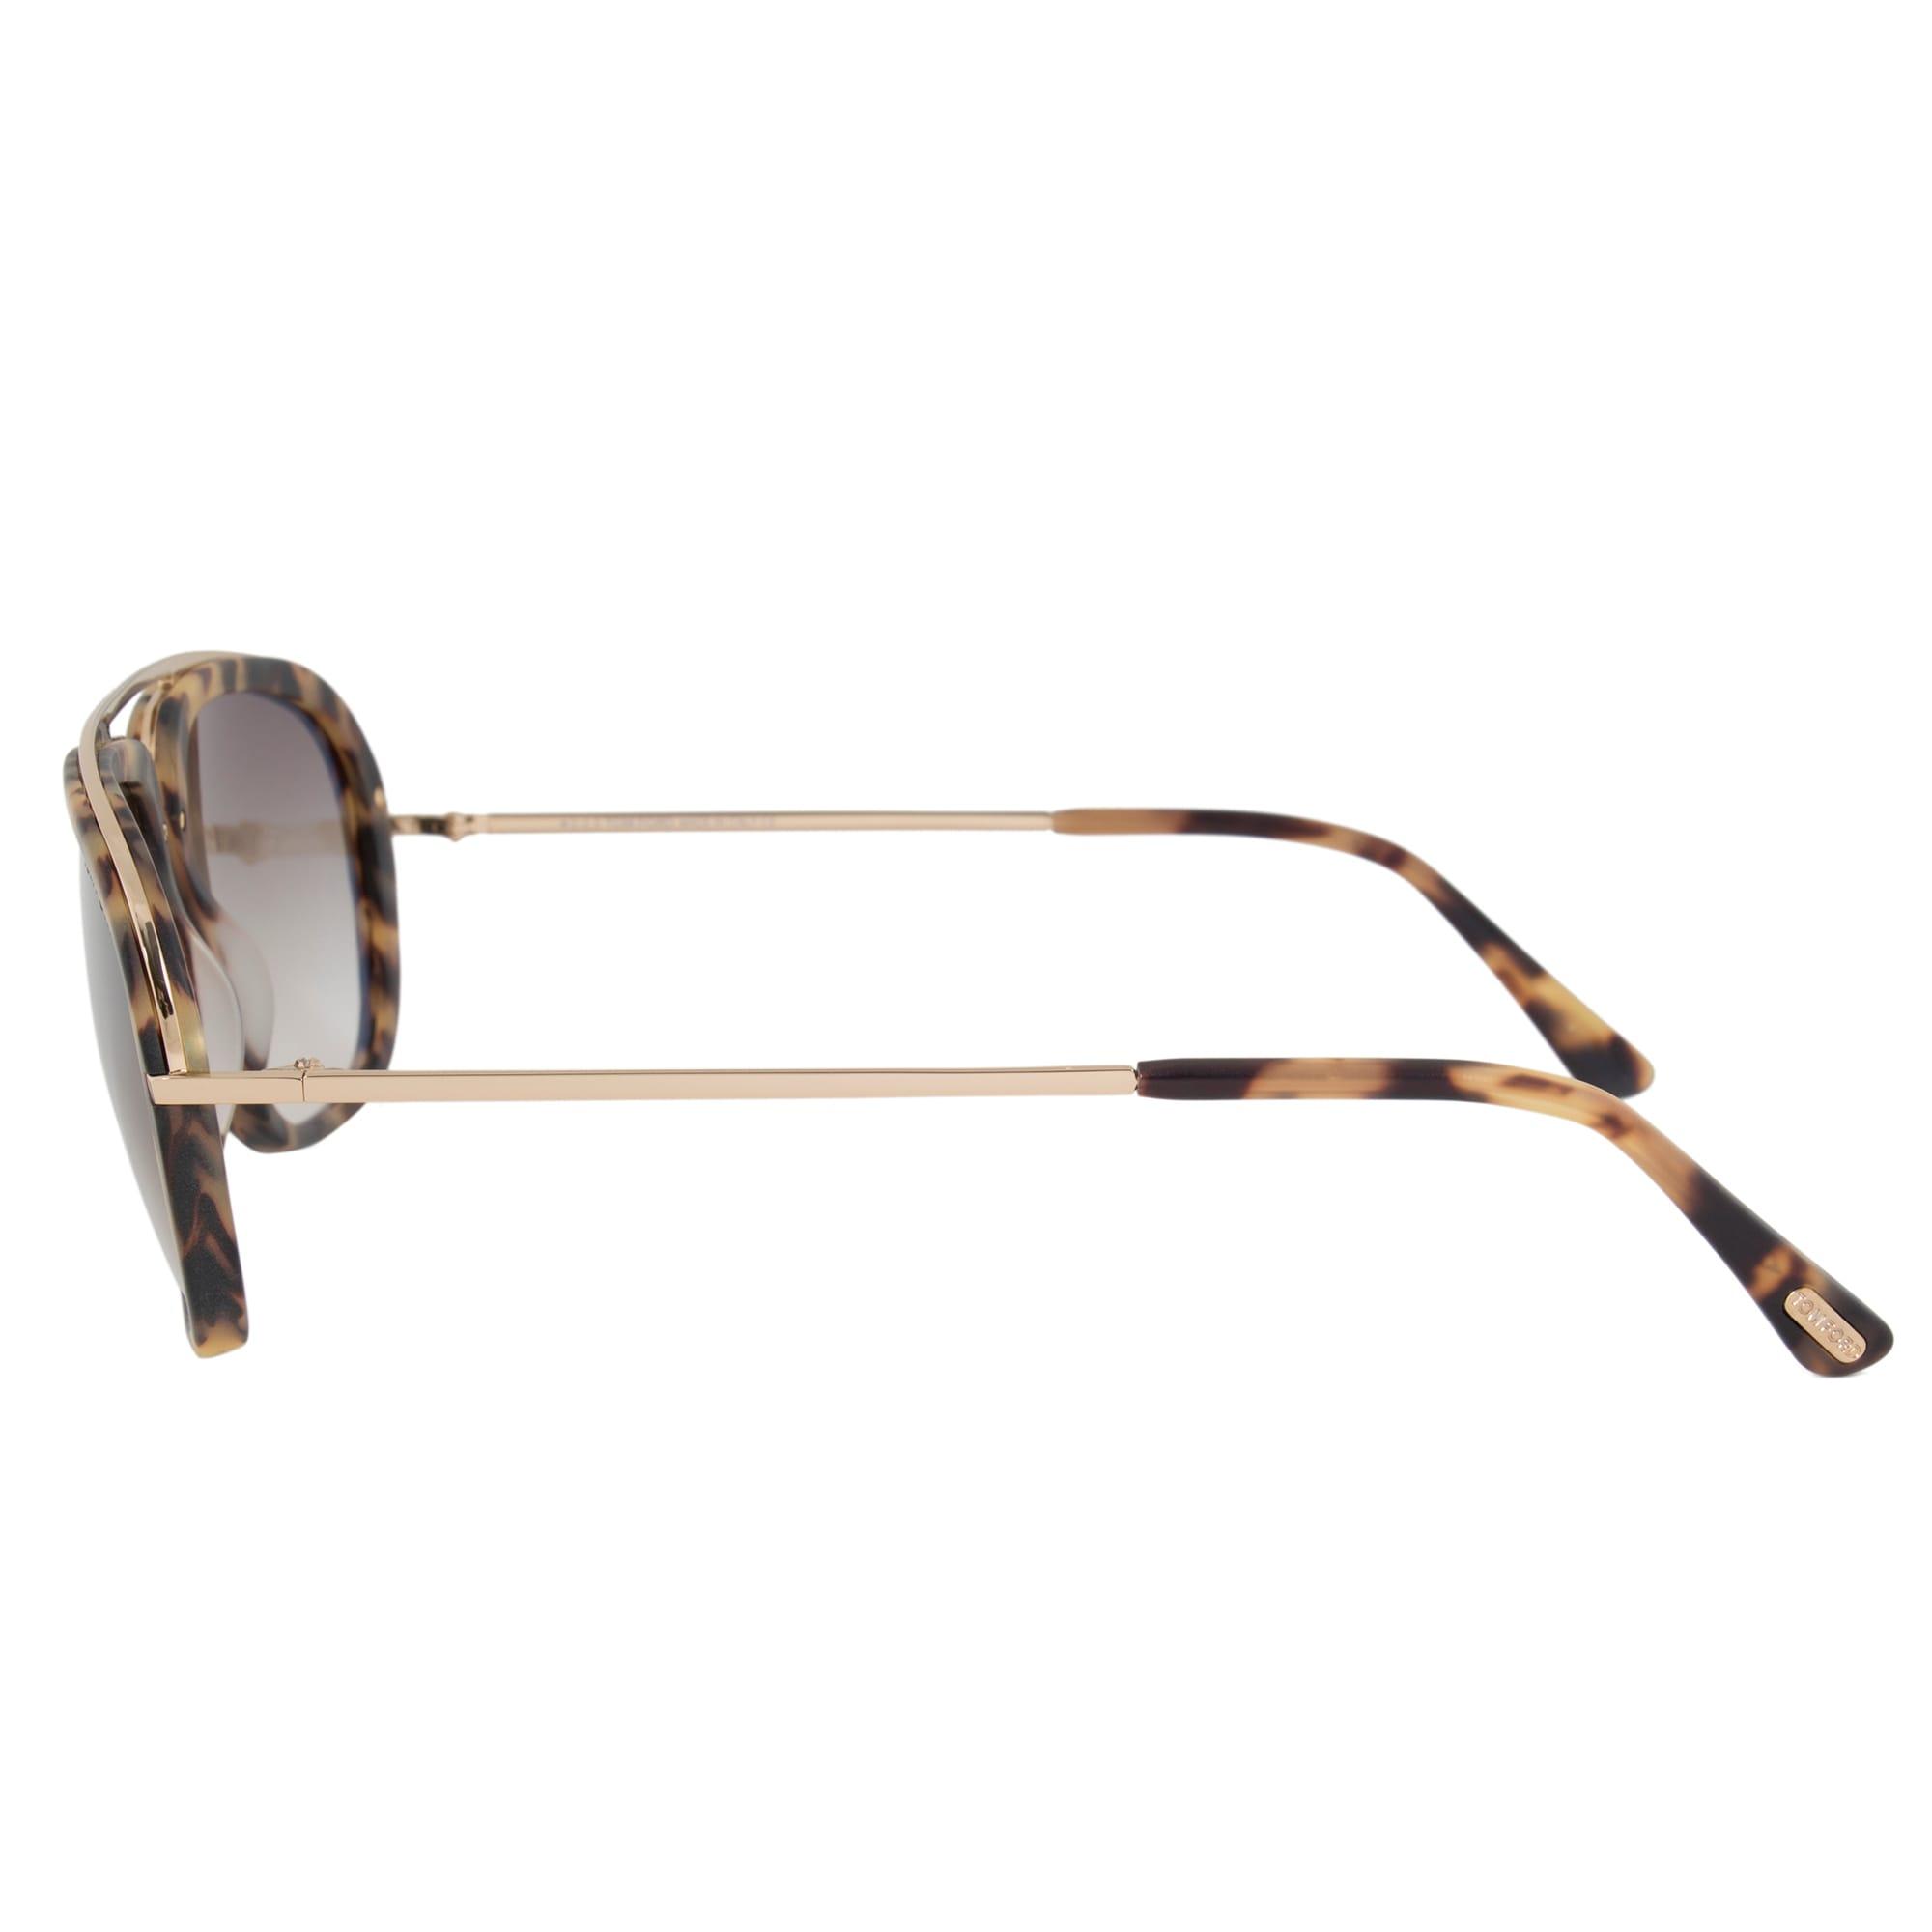 ae5ade1db7 Shop Tom Ford Johnson Men s Navigator Sunglasses FT0453 53F 57 ...